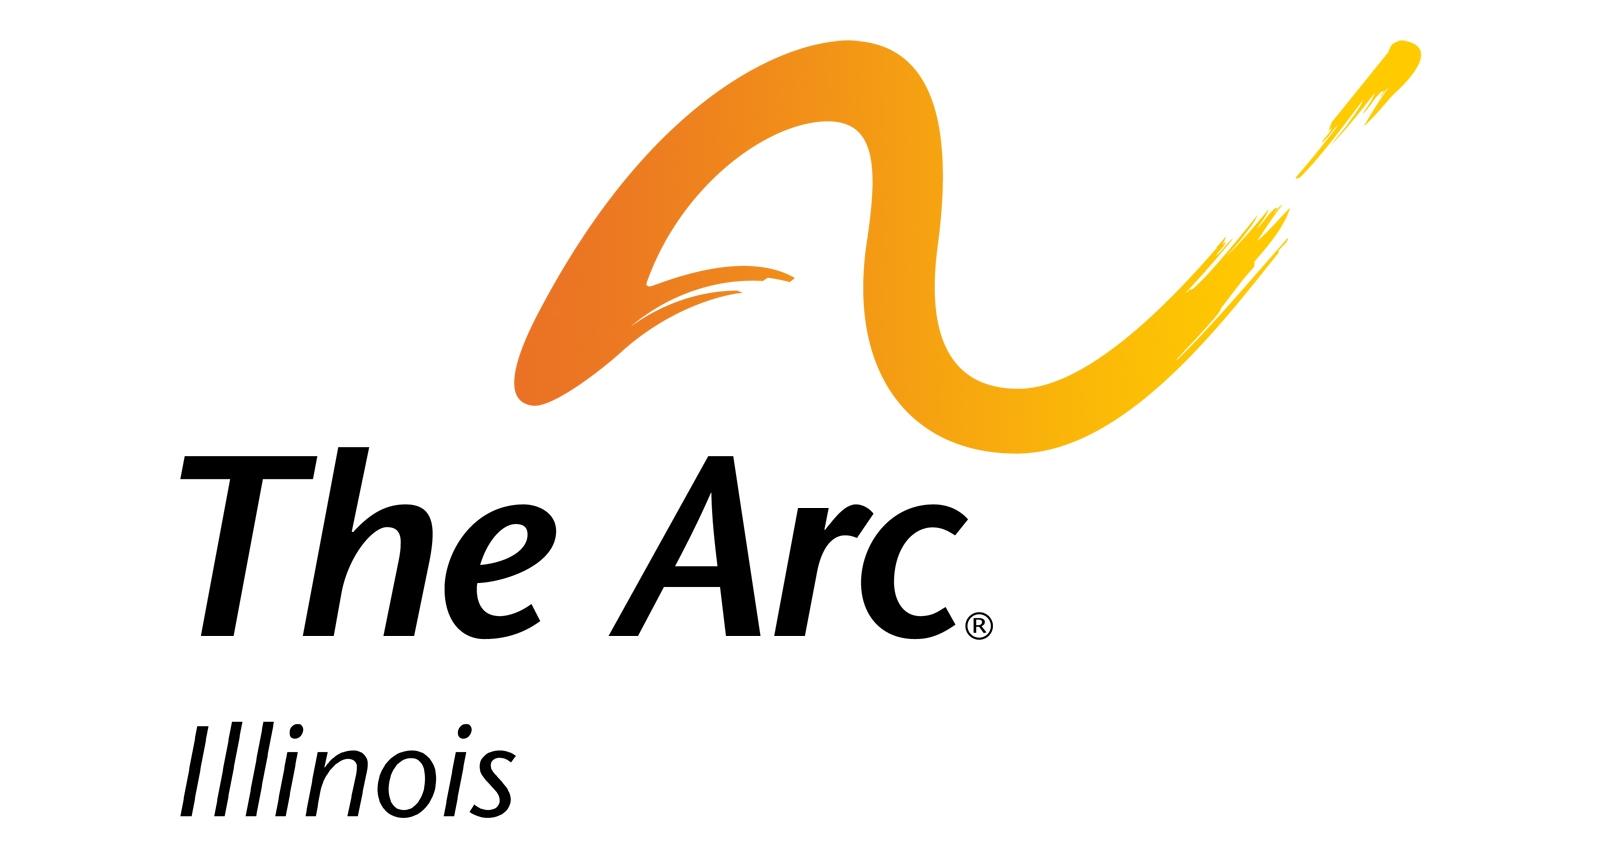 The Arc of Illinois